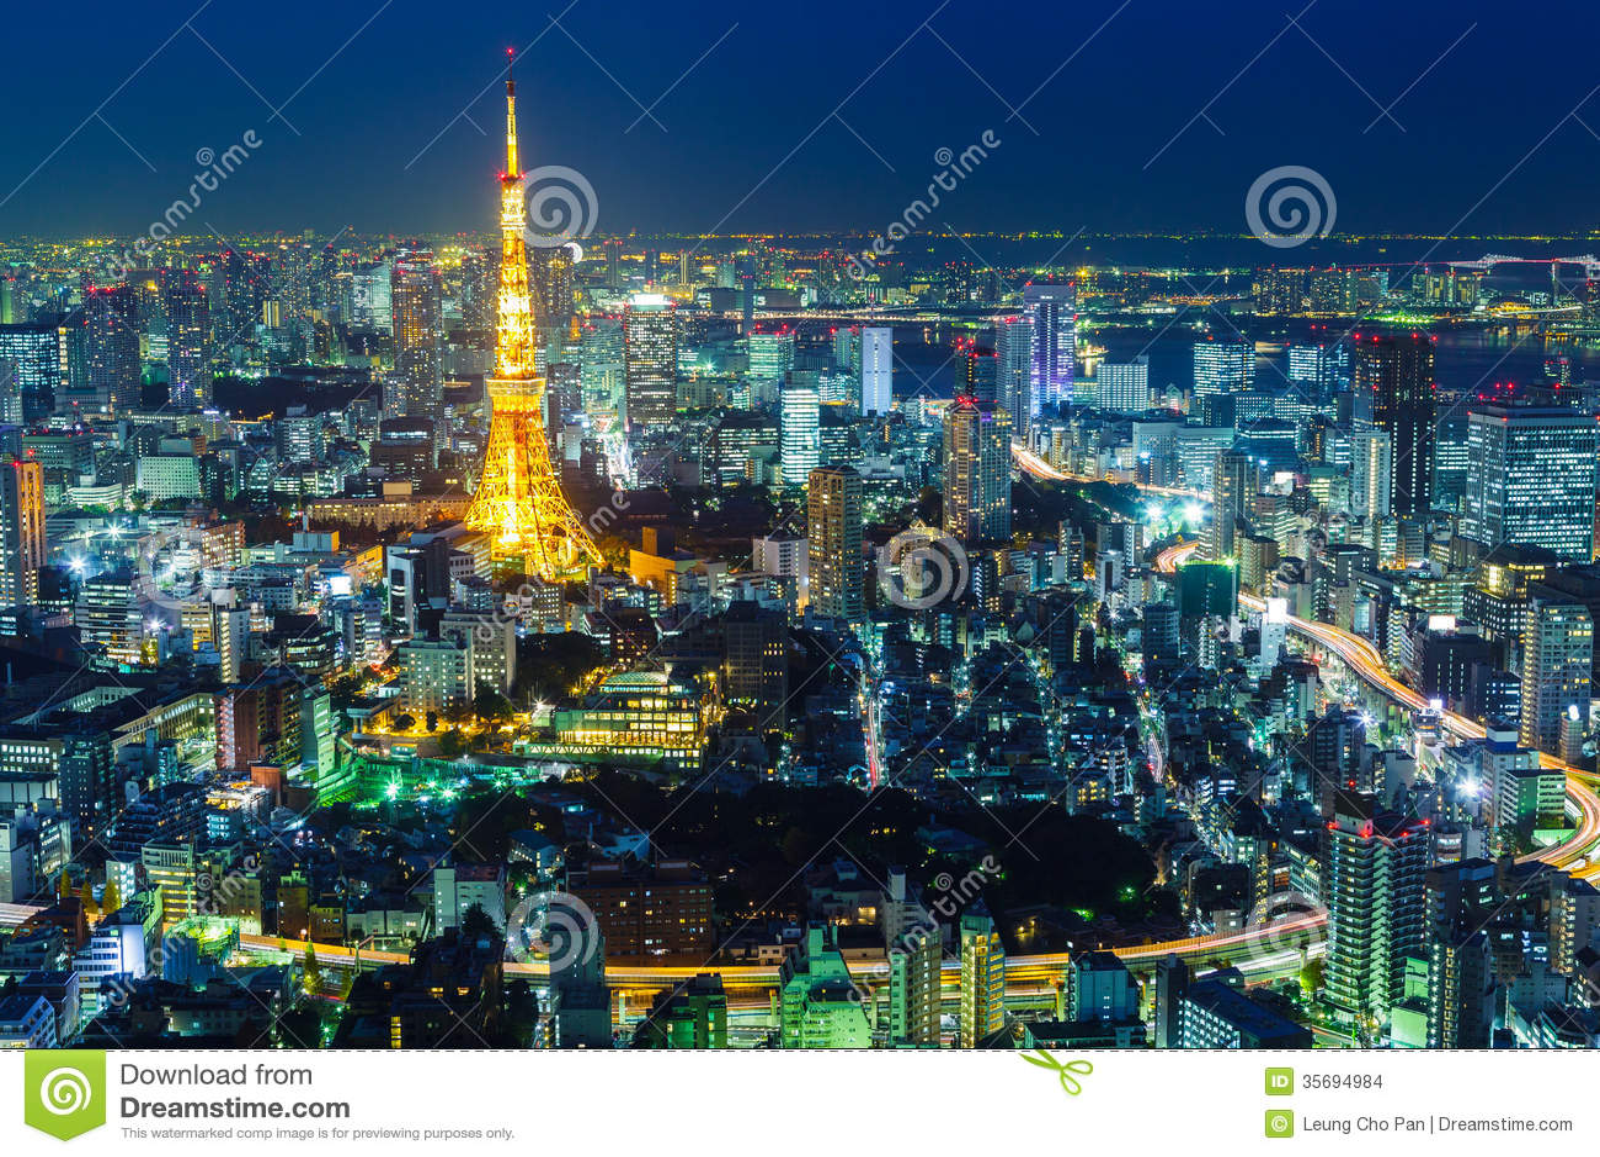 tokyo city for pinterest - photo #31